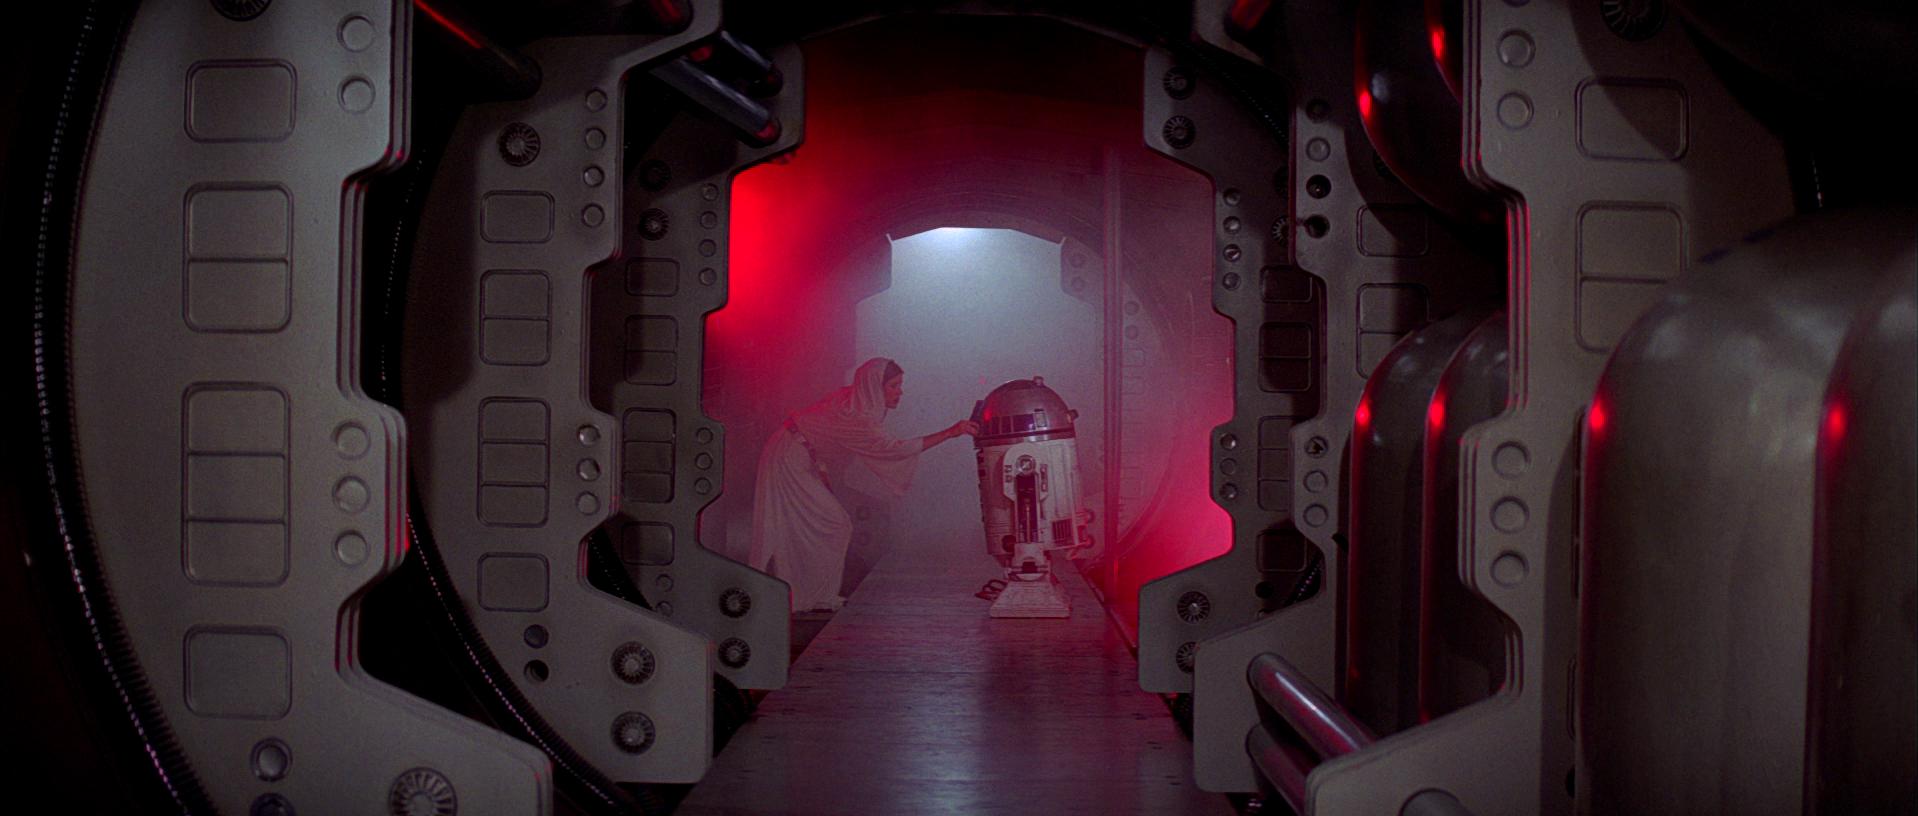 6 - Leia and R2